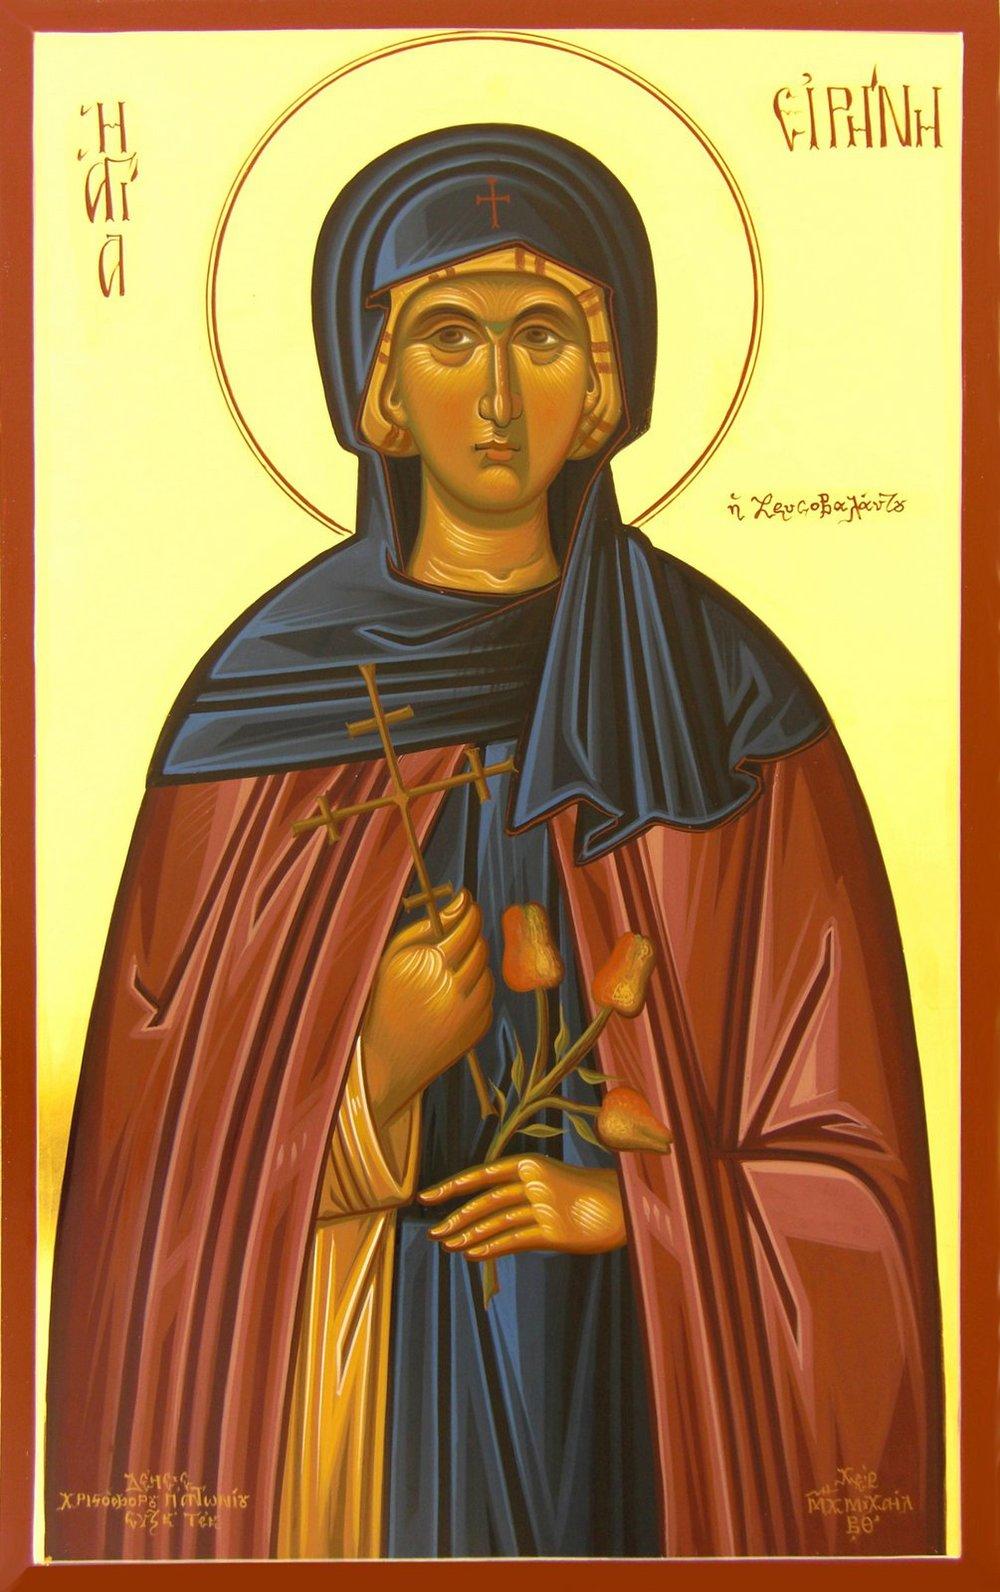 St. Irene Chrysovolanto